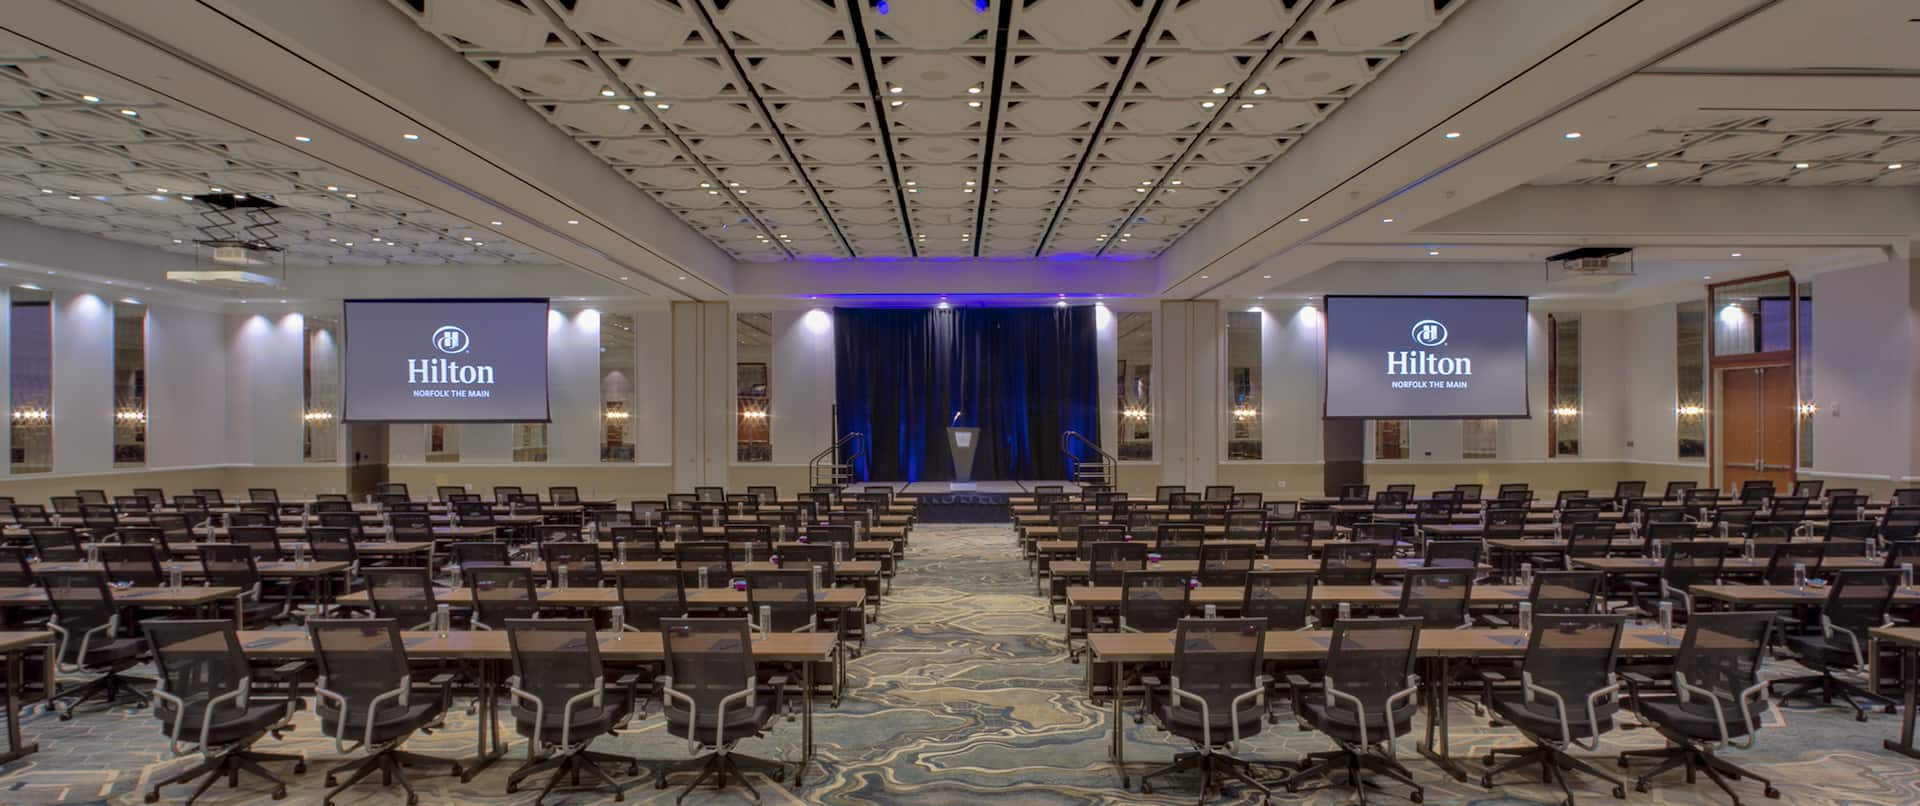 Ballroom Meeting Set-Up